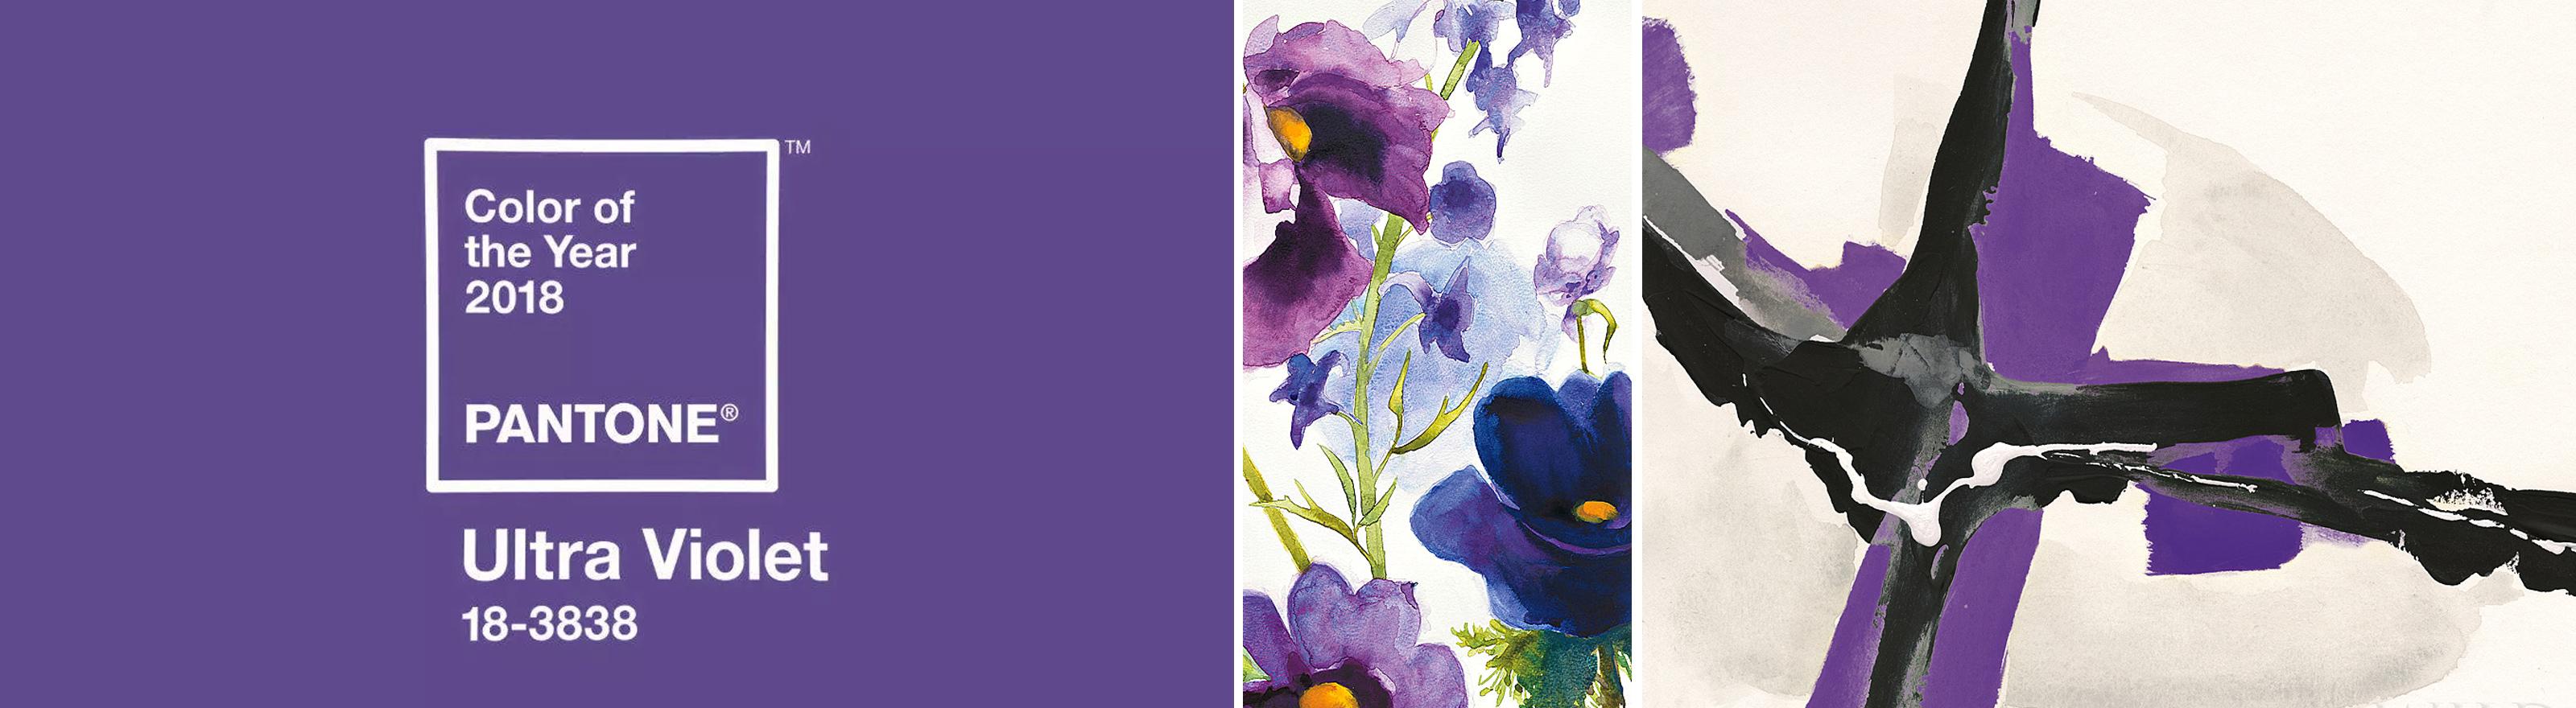 Pantone's Ultra Violet